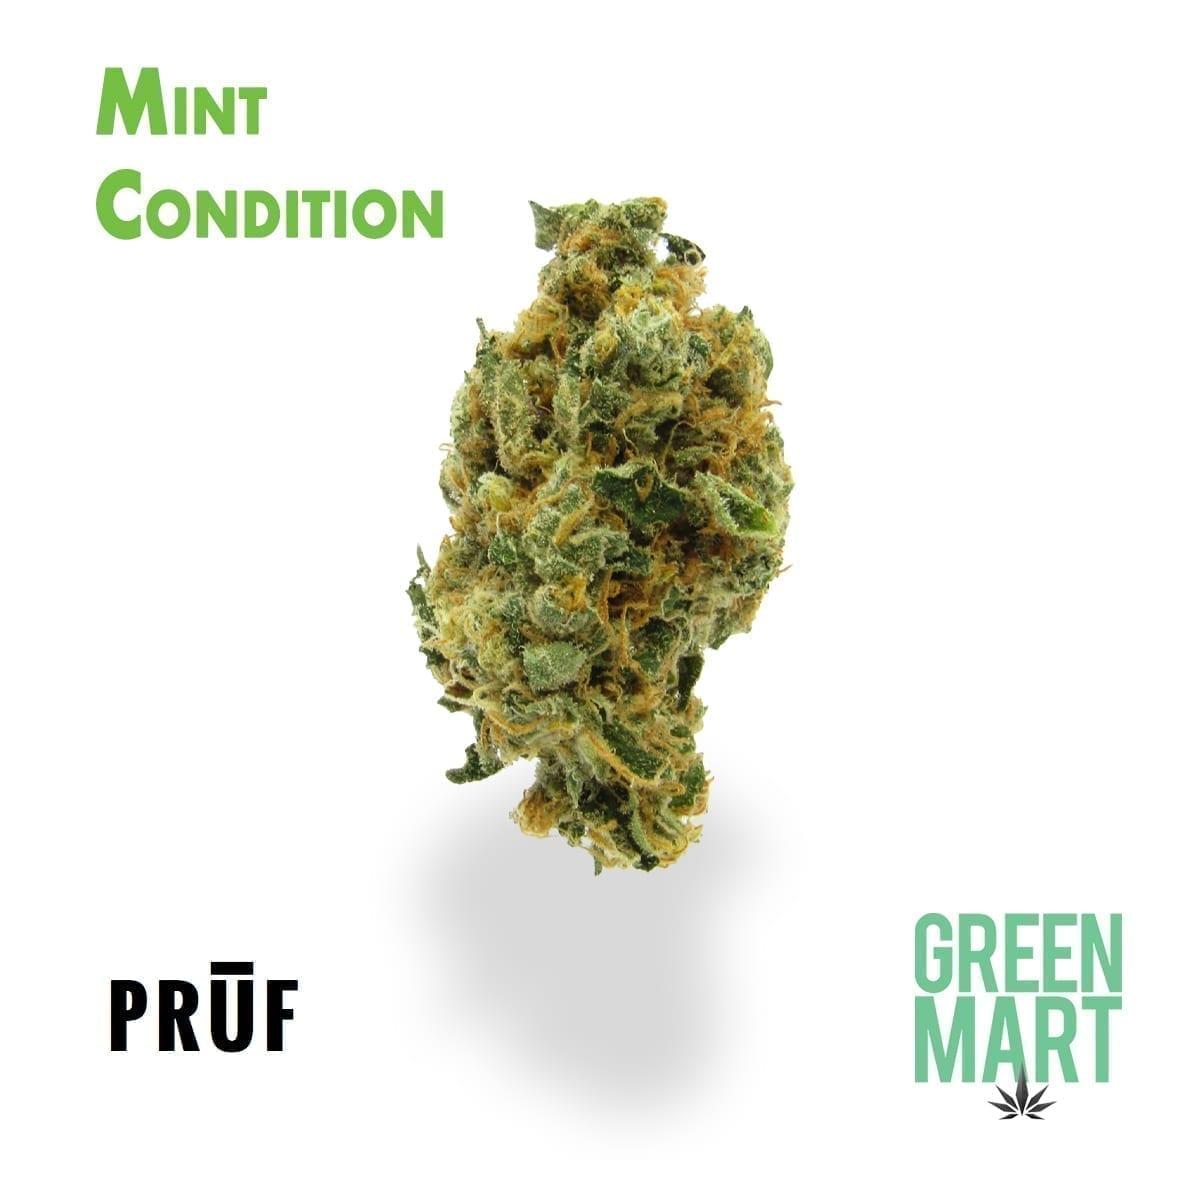 Pruf Mind Condition Flower